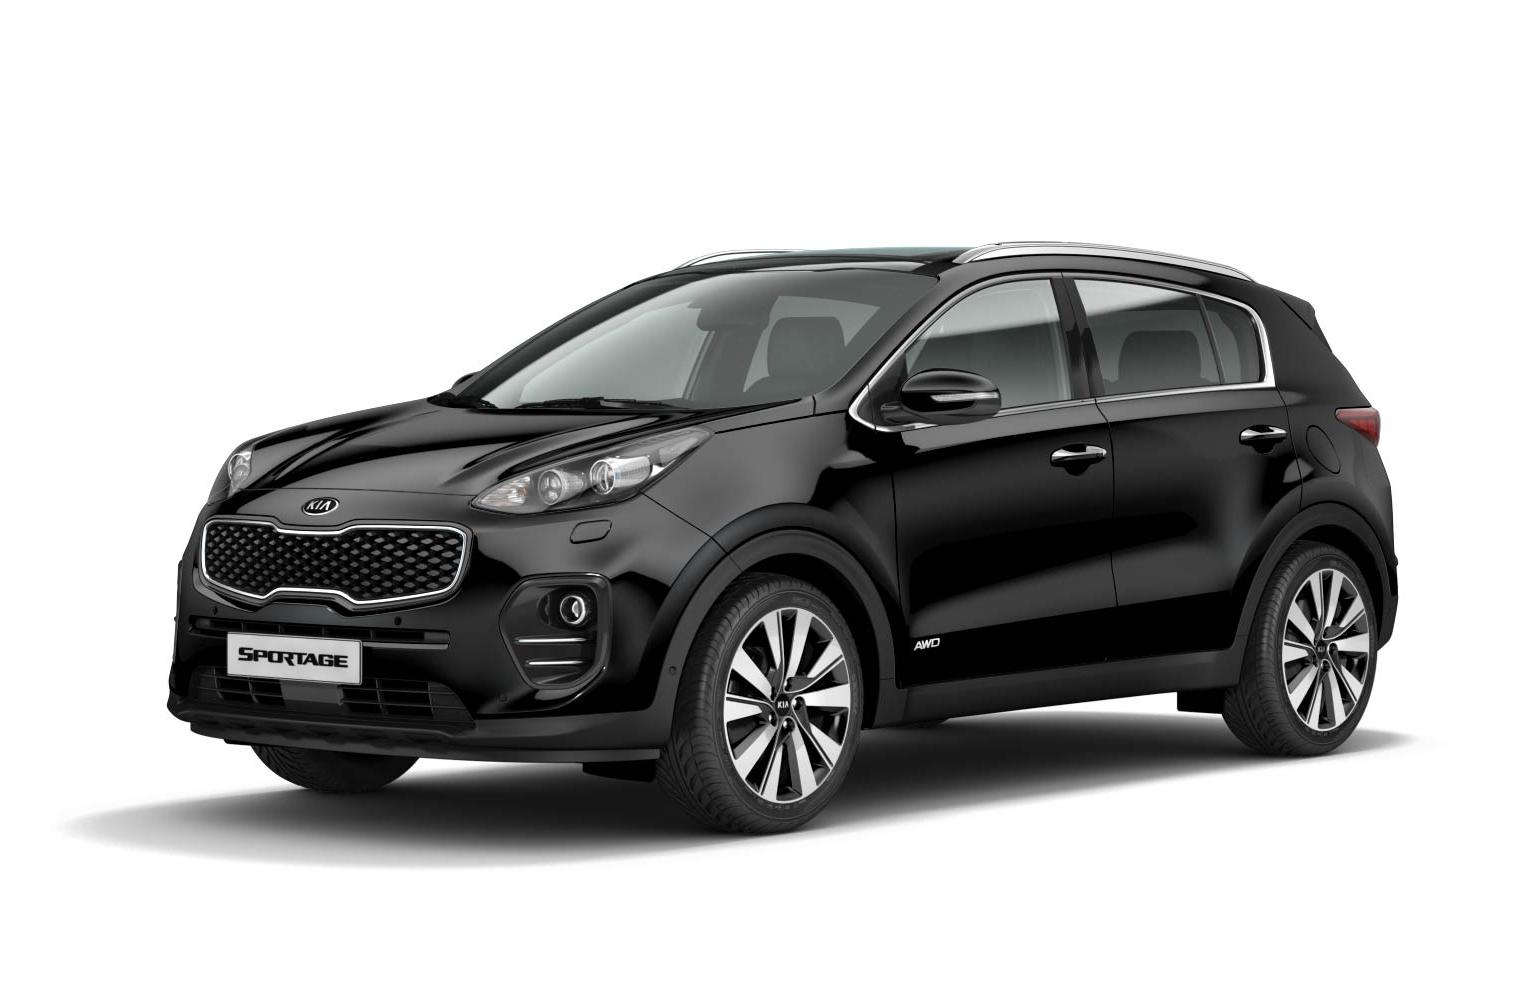 2016 kia sportage black 200 interior and exterior images